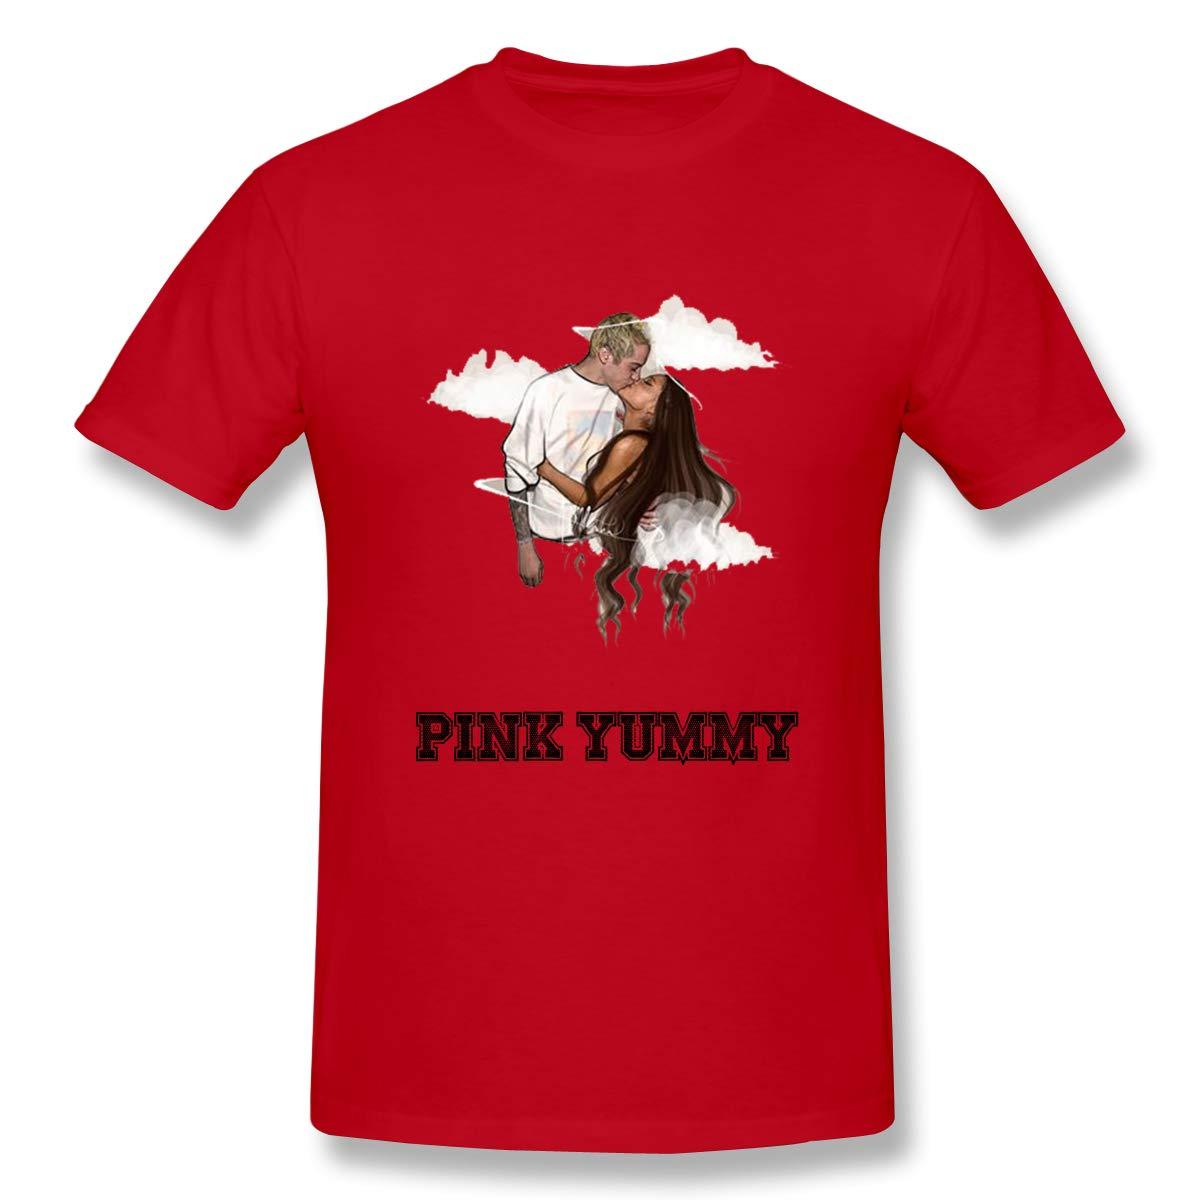 Pink Yummy Cute Shirt for Unisex of Ava M.ax//Ariana Gran.de//Hal.say Cartoon Sticker